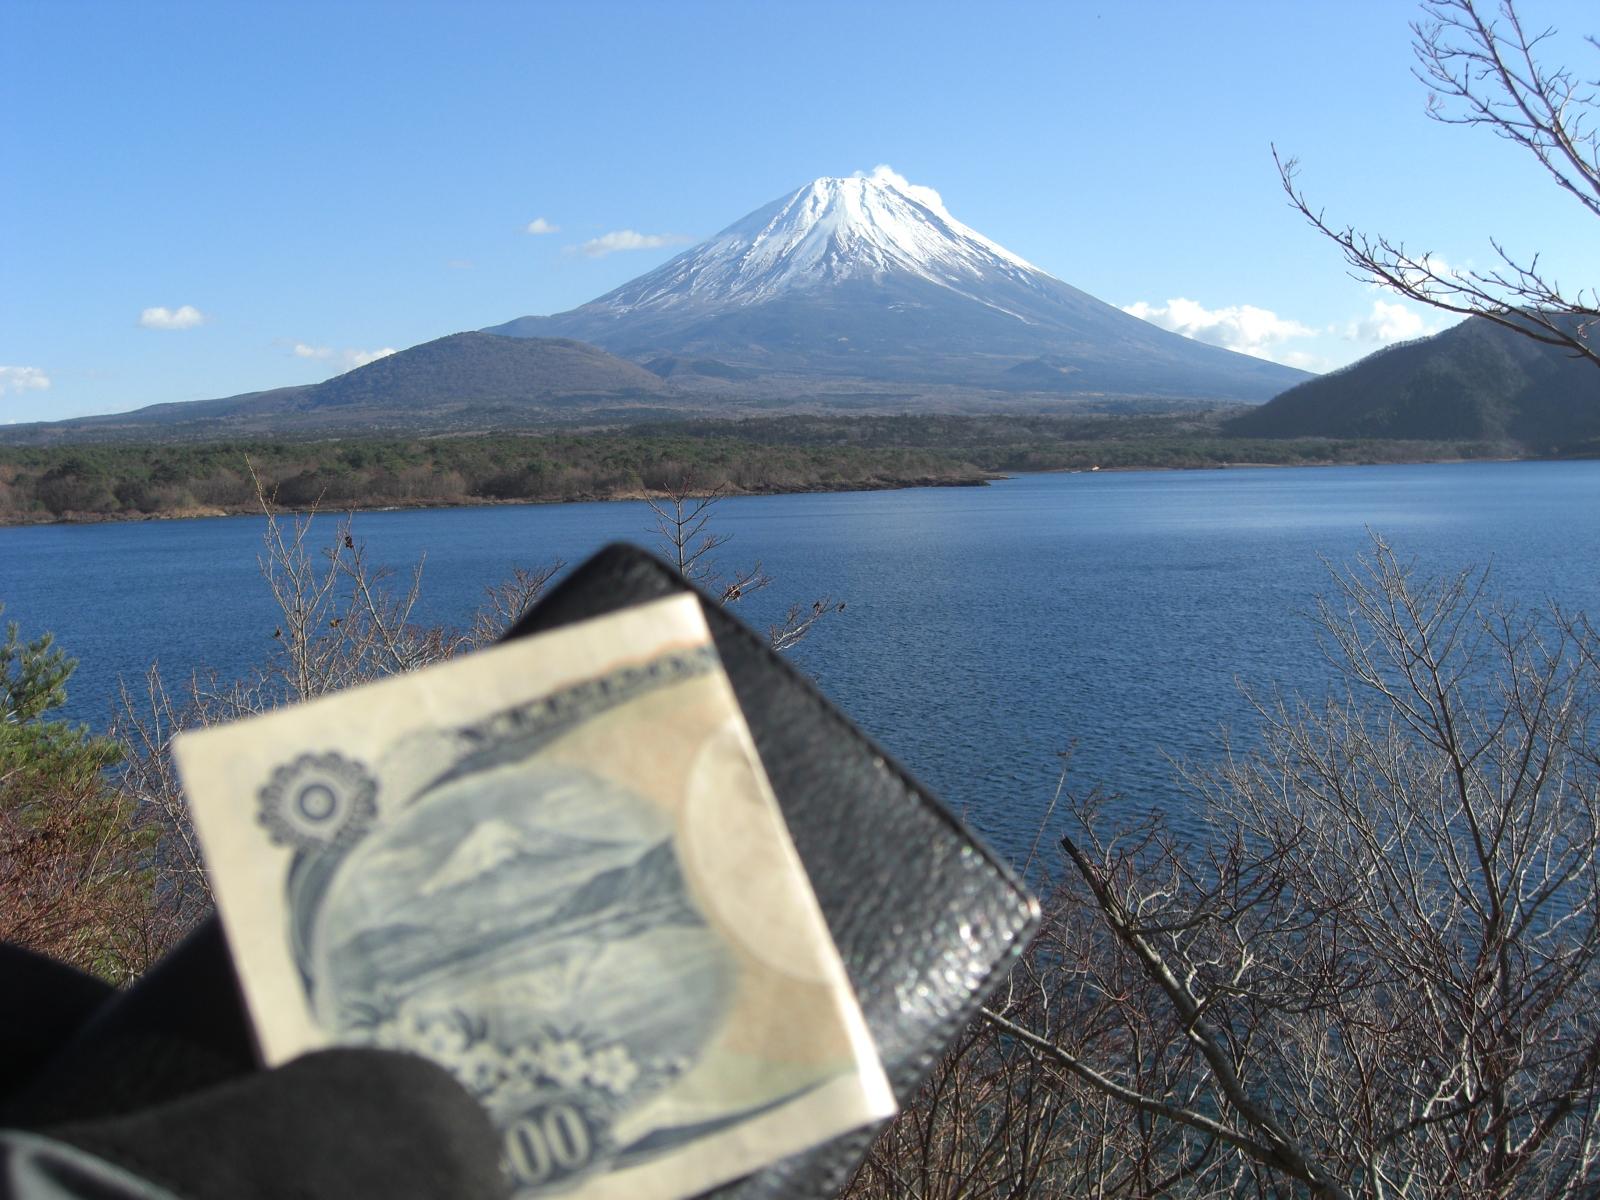 極寒・富士山周遊ツーリング 本栖湖千円札裏面